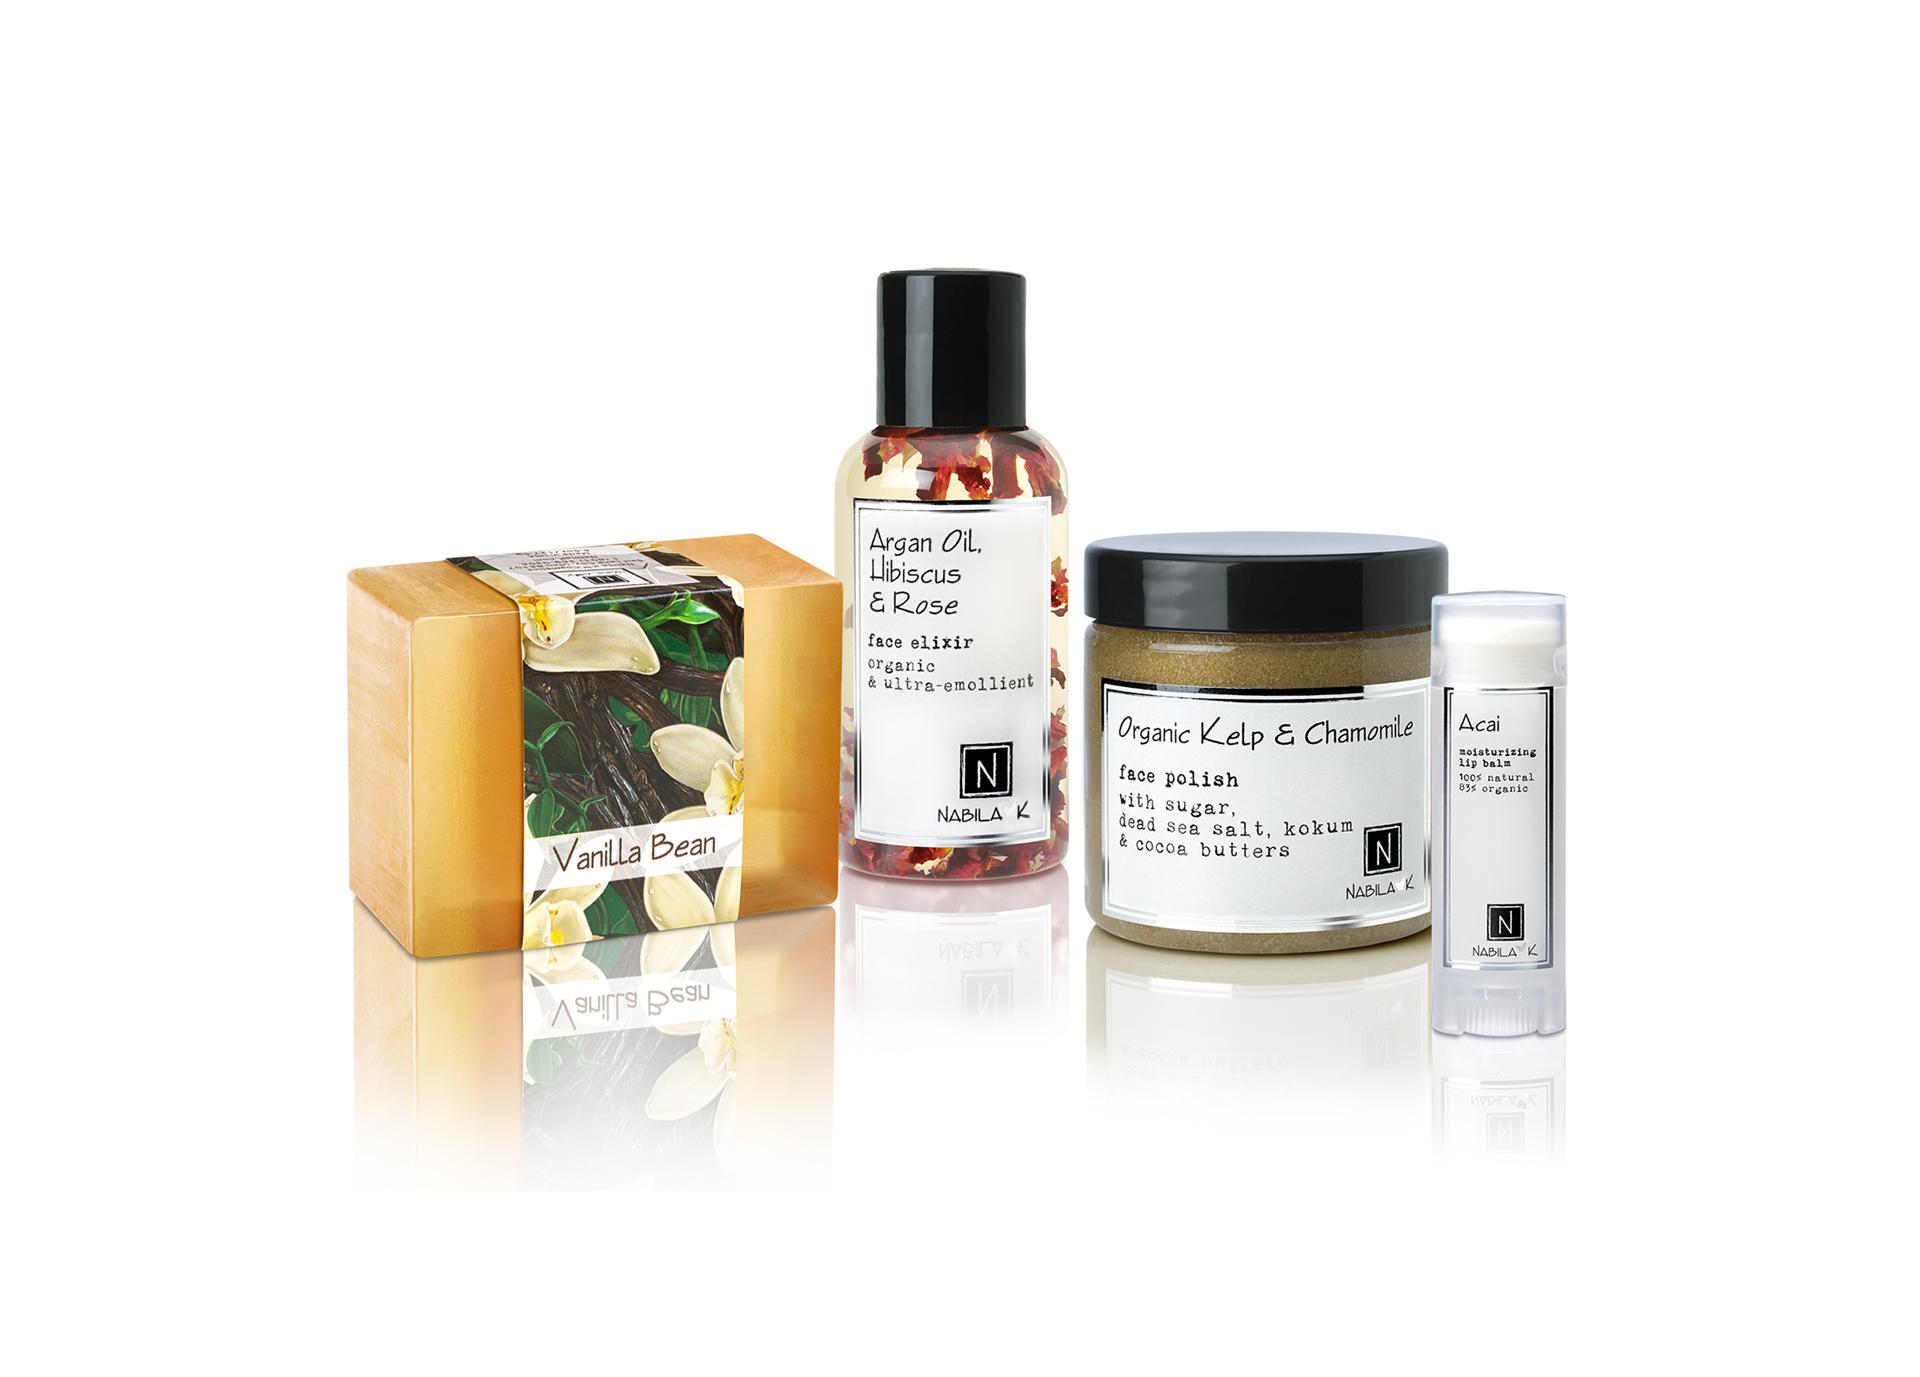 Natural Detox Box with Argan Oil serum, vanilla glycerin soap, organic kelp/Chamomile face polish, and Acai lip balm.